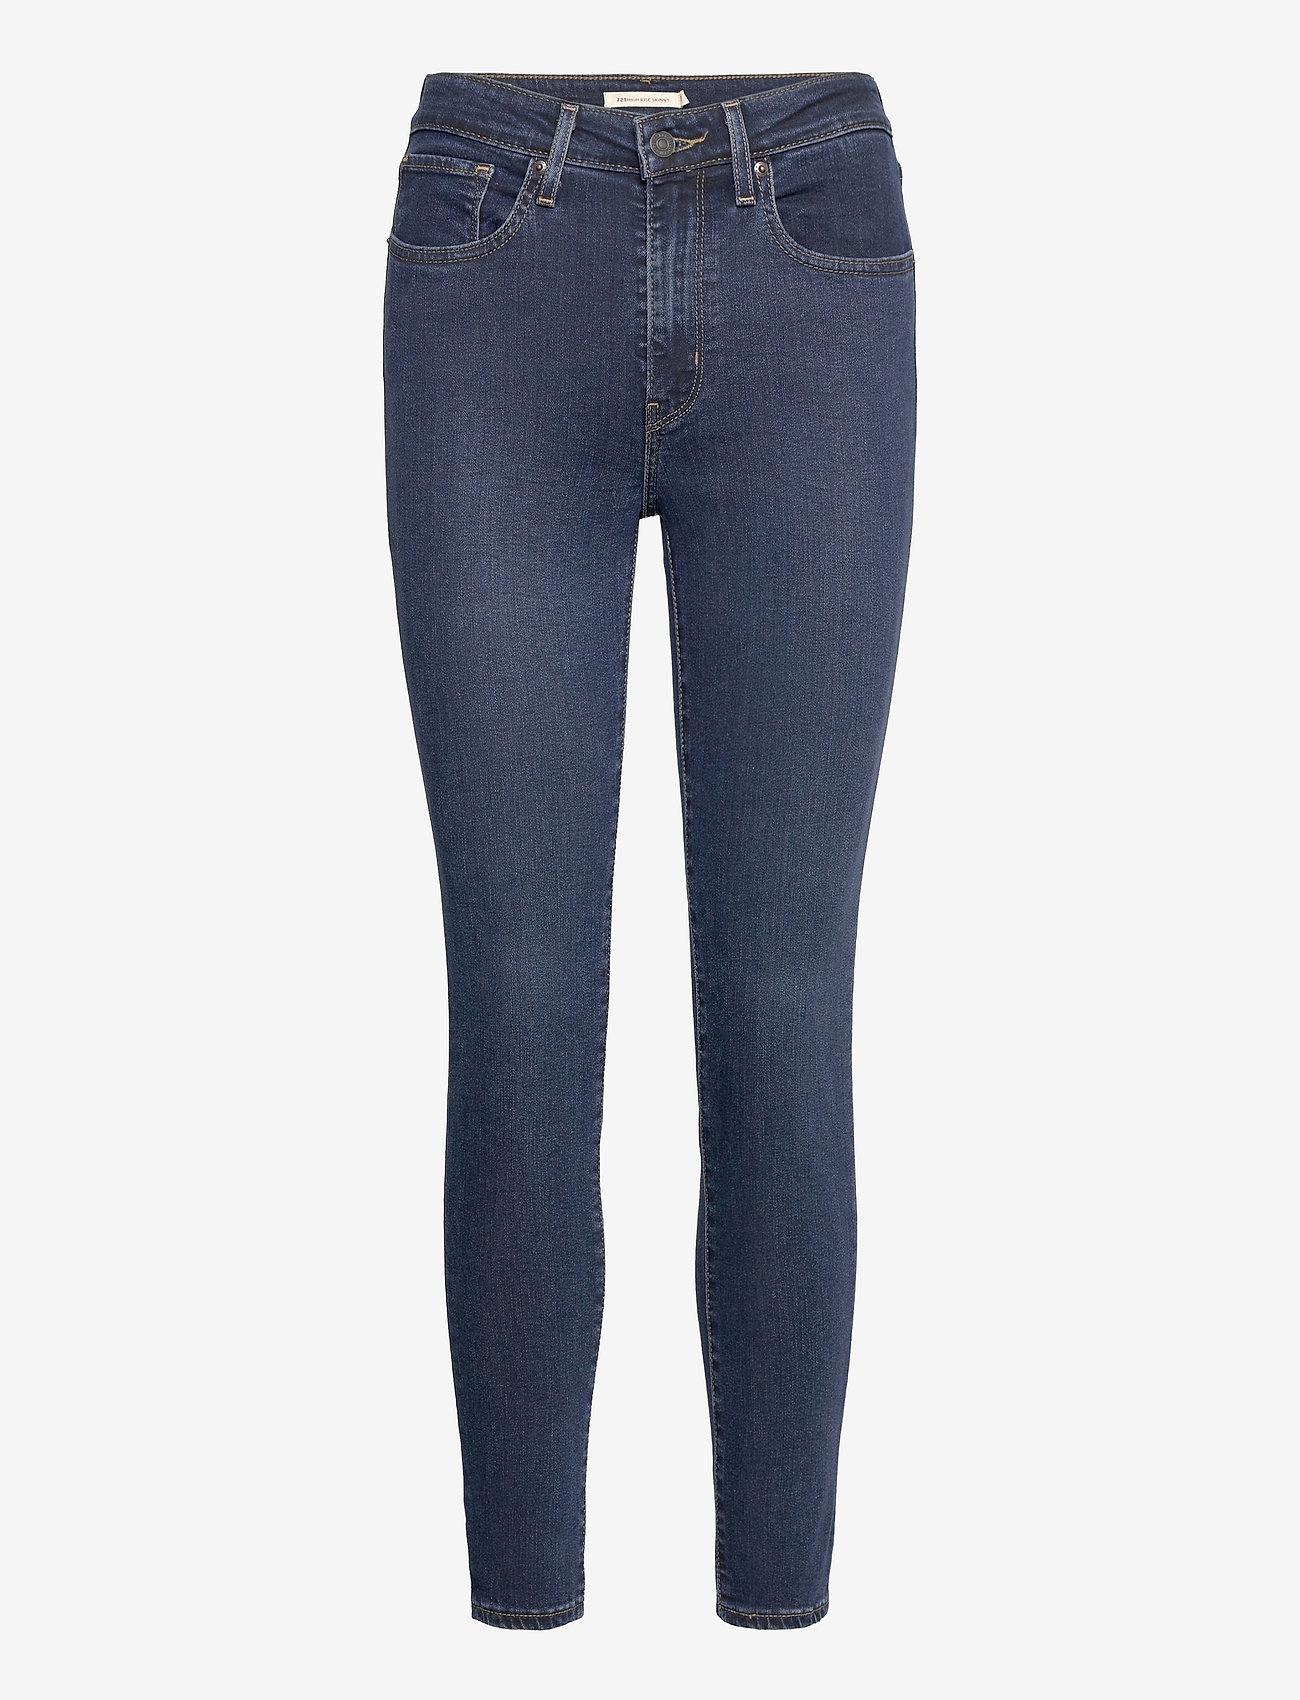 LEVI´S Women - 721 HIGH RISE SKINNY SANTIAGO - skinny jeans - dark indigo - worn in - 0